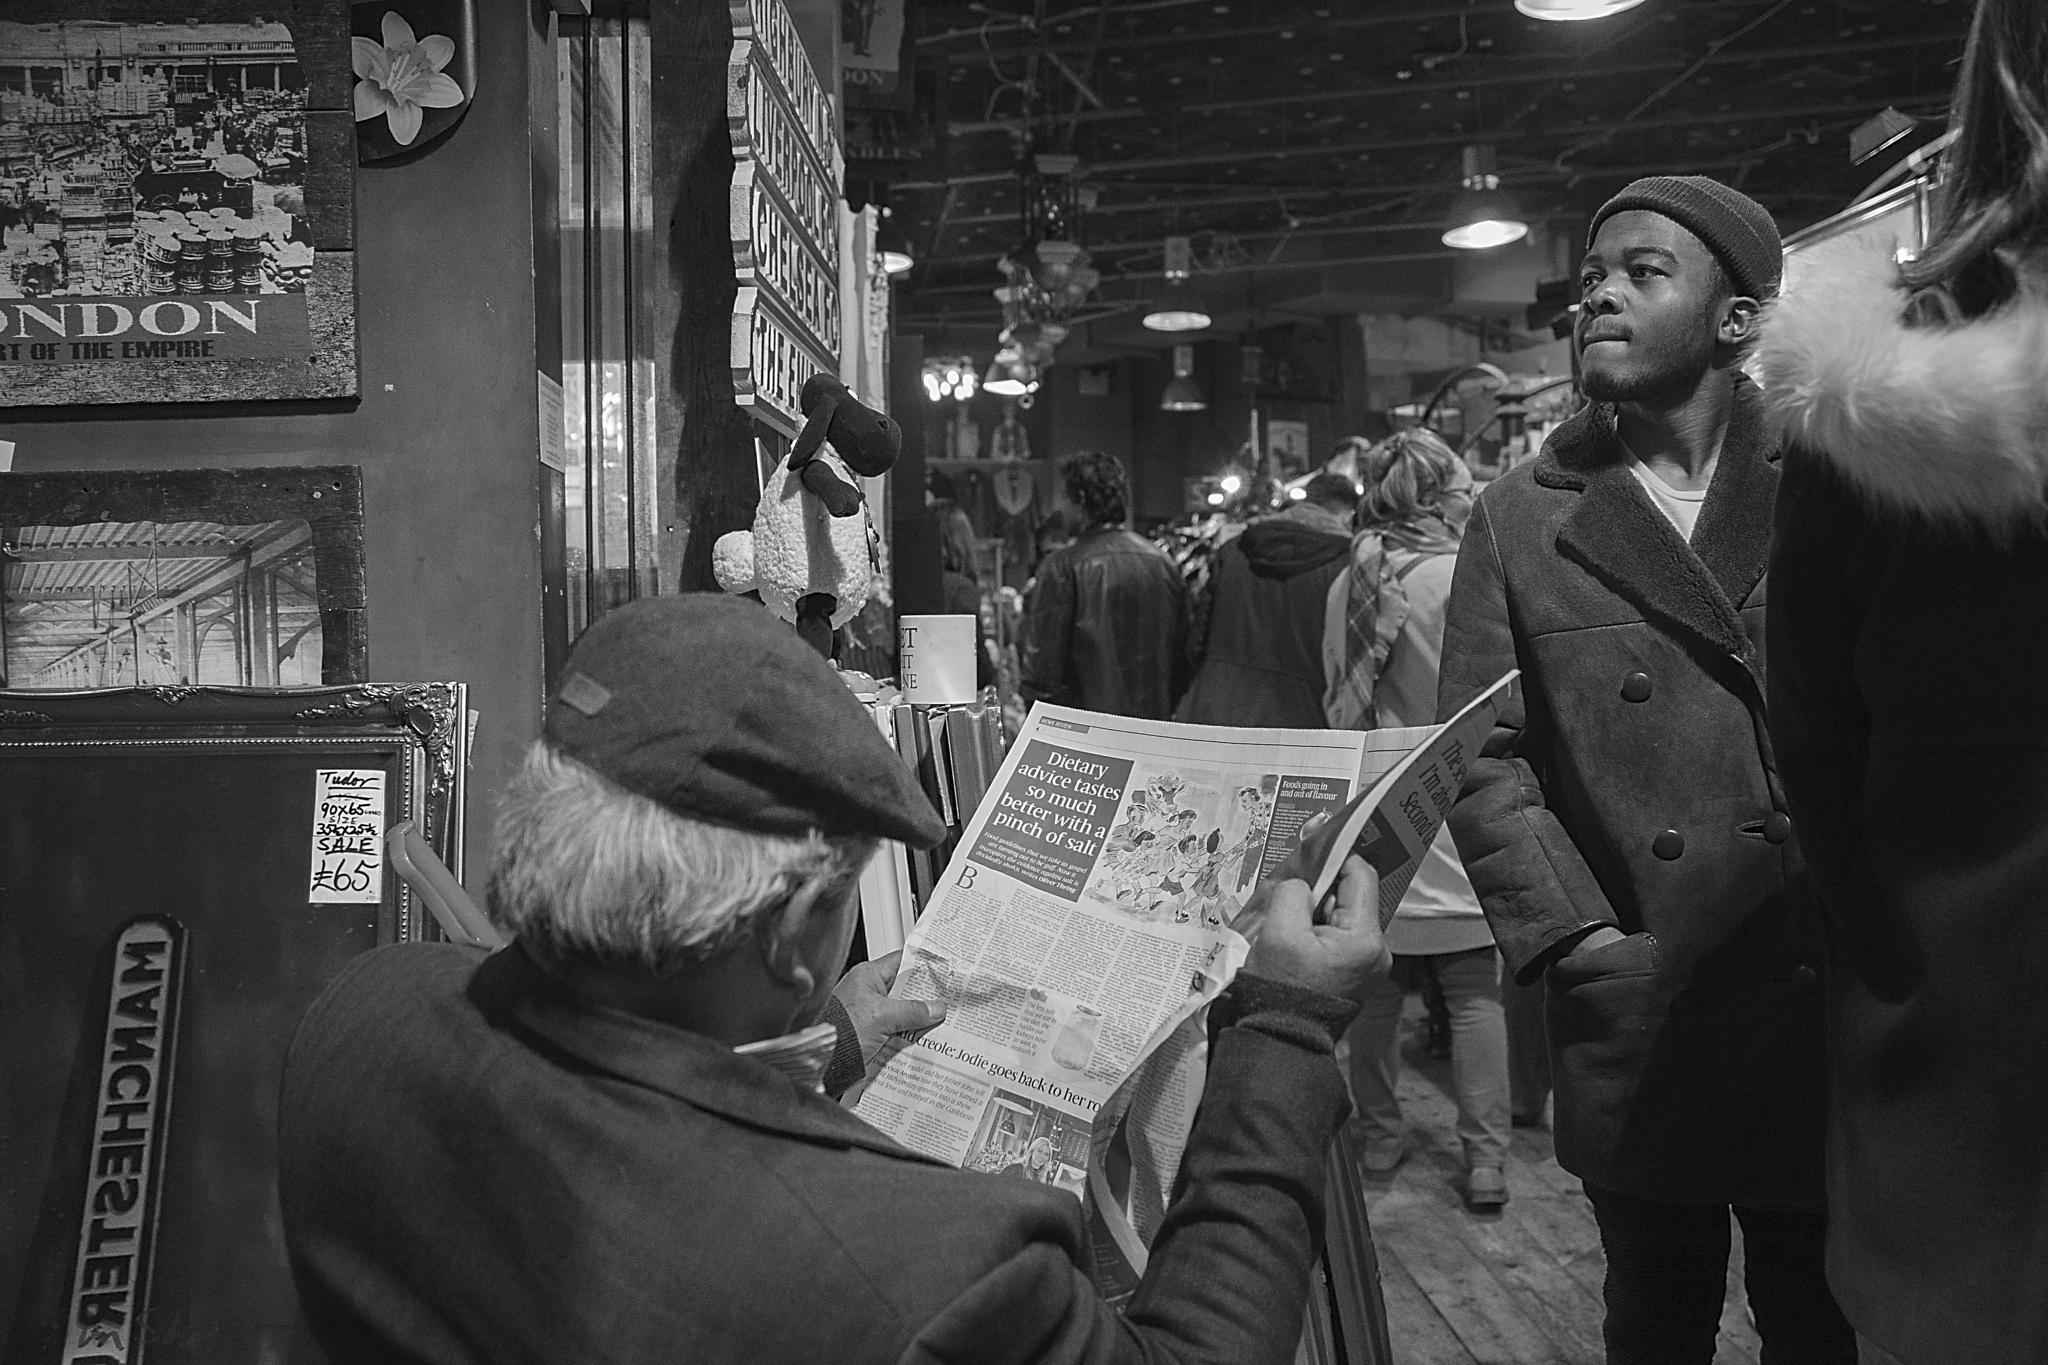 Man reading a newspaper by Darek Baranowski